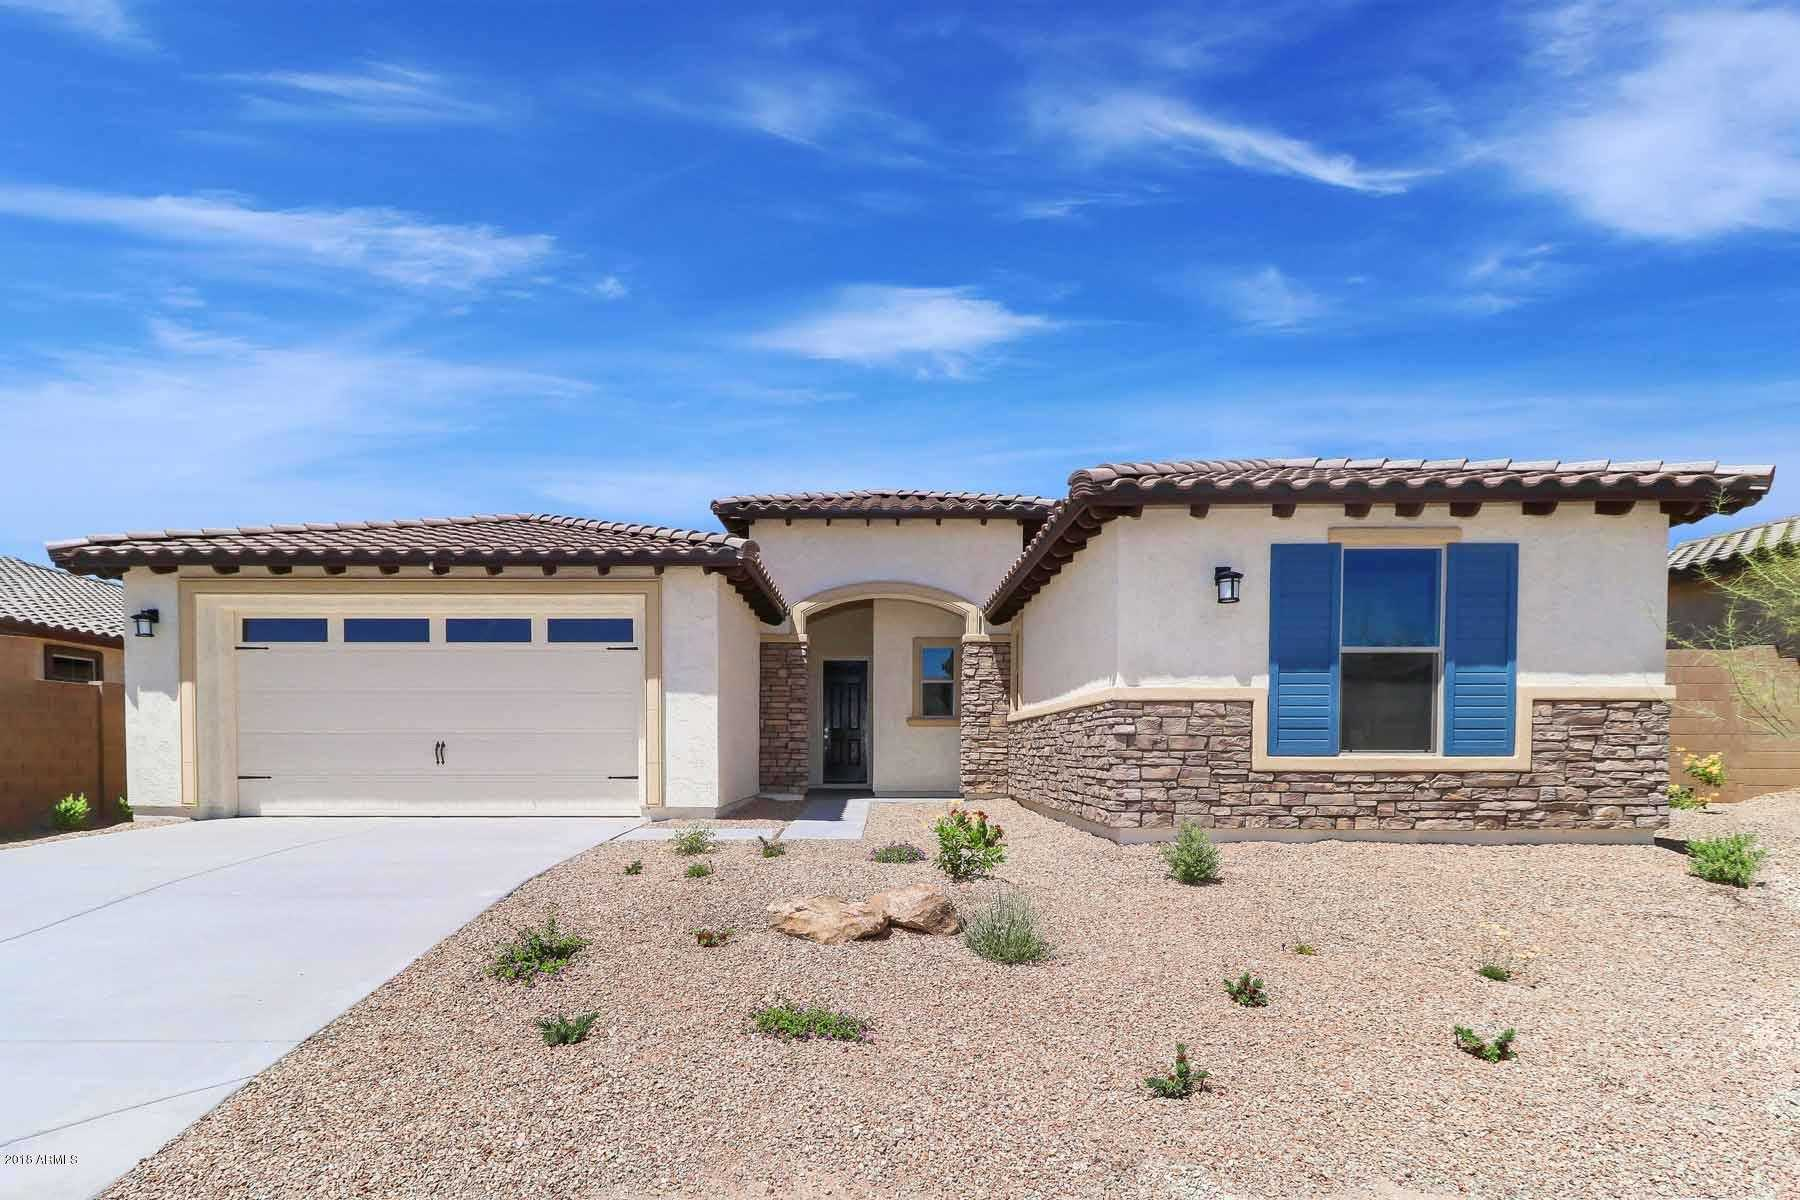 $356,900 - 4Br/3Ba - Home for Sale in Montecito Village At Estrella Mtn Ranch Parel 9.5, Goodyear